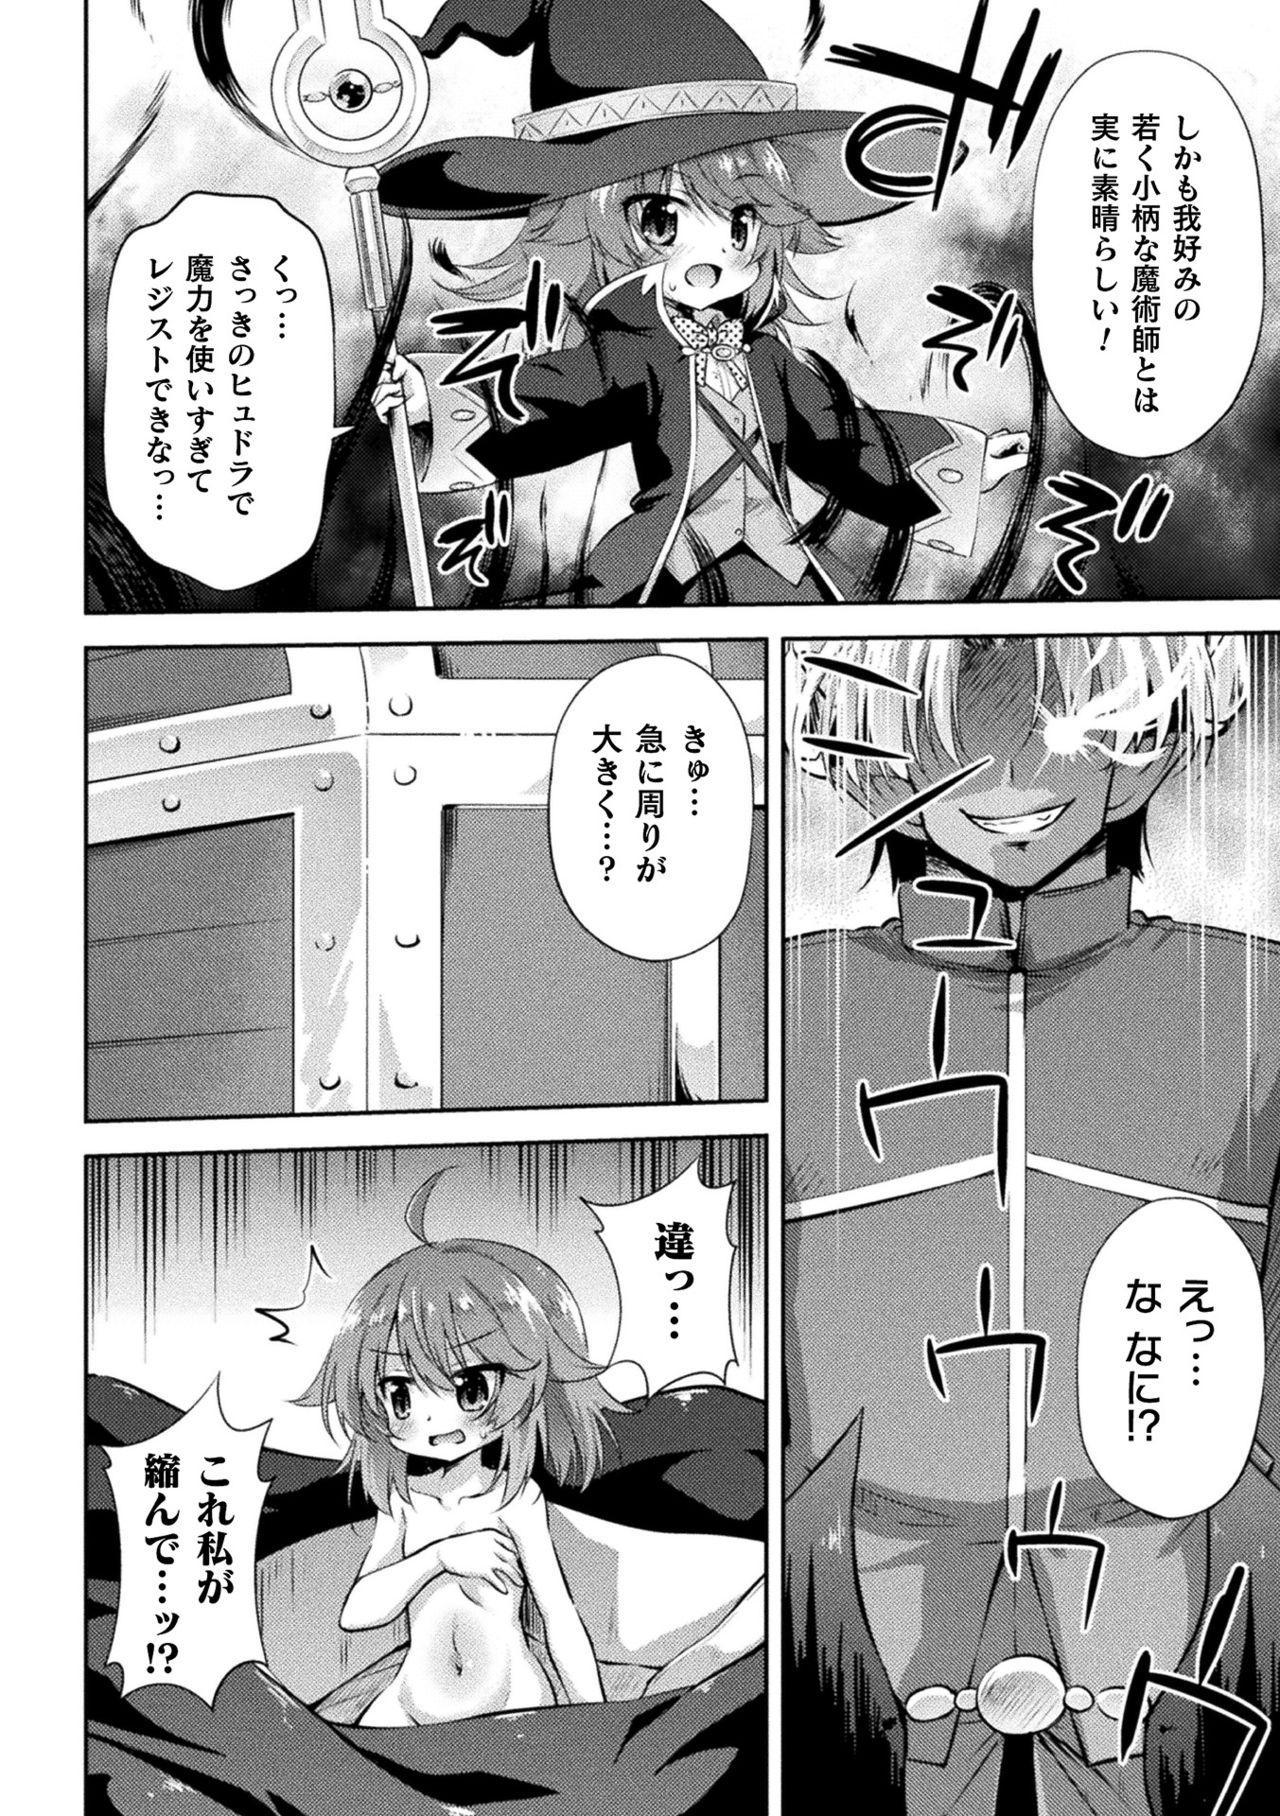 2D Comic Magazine - Syukusyouka Hiroin Kyousei Onahole Keikaku Vol. 2 61